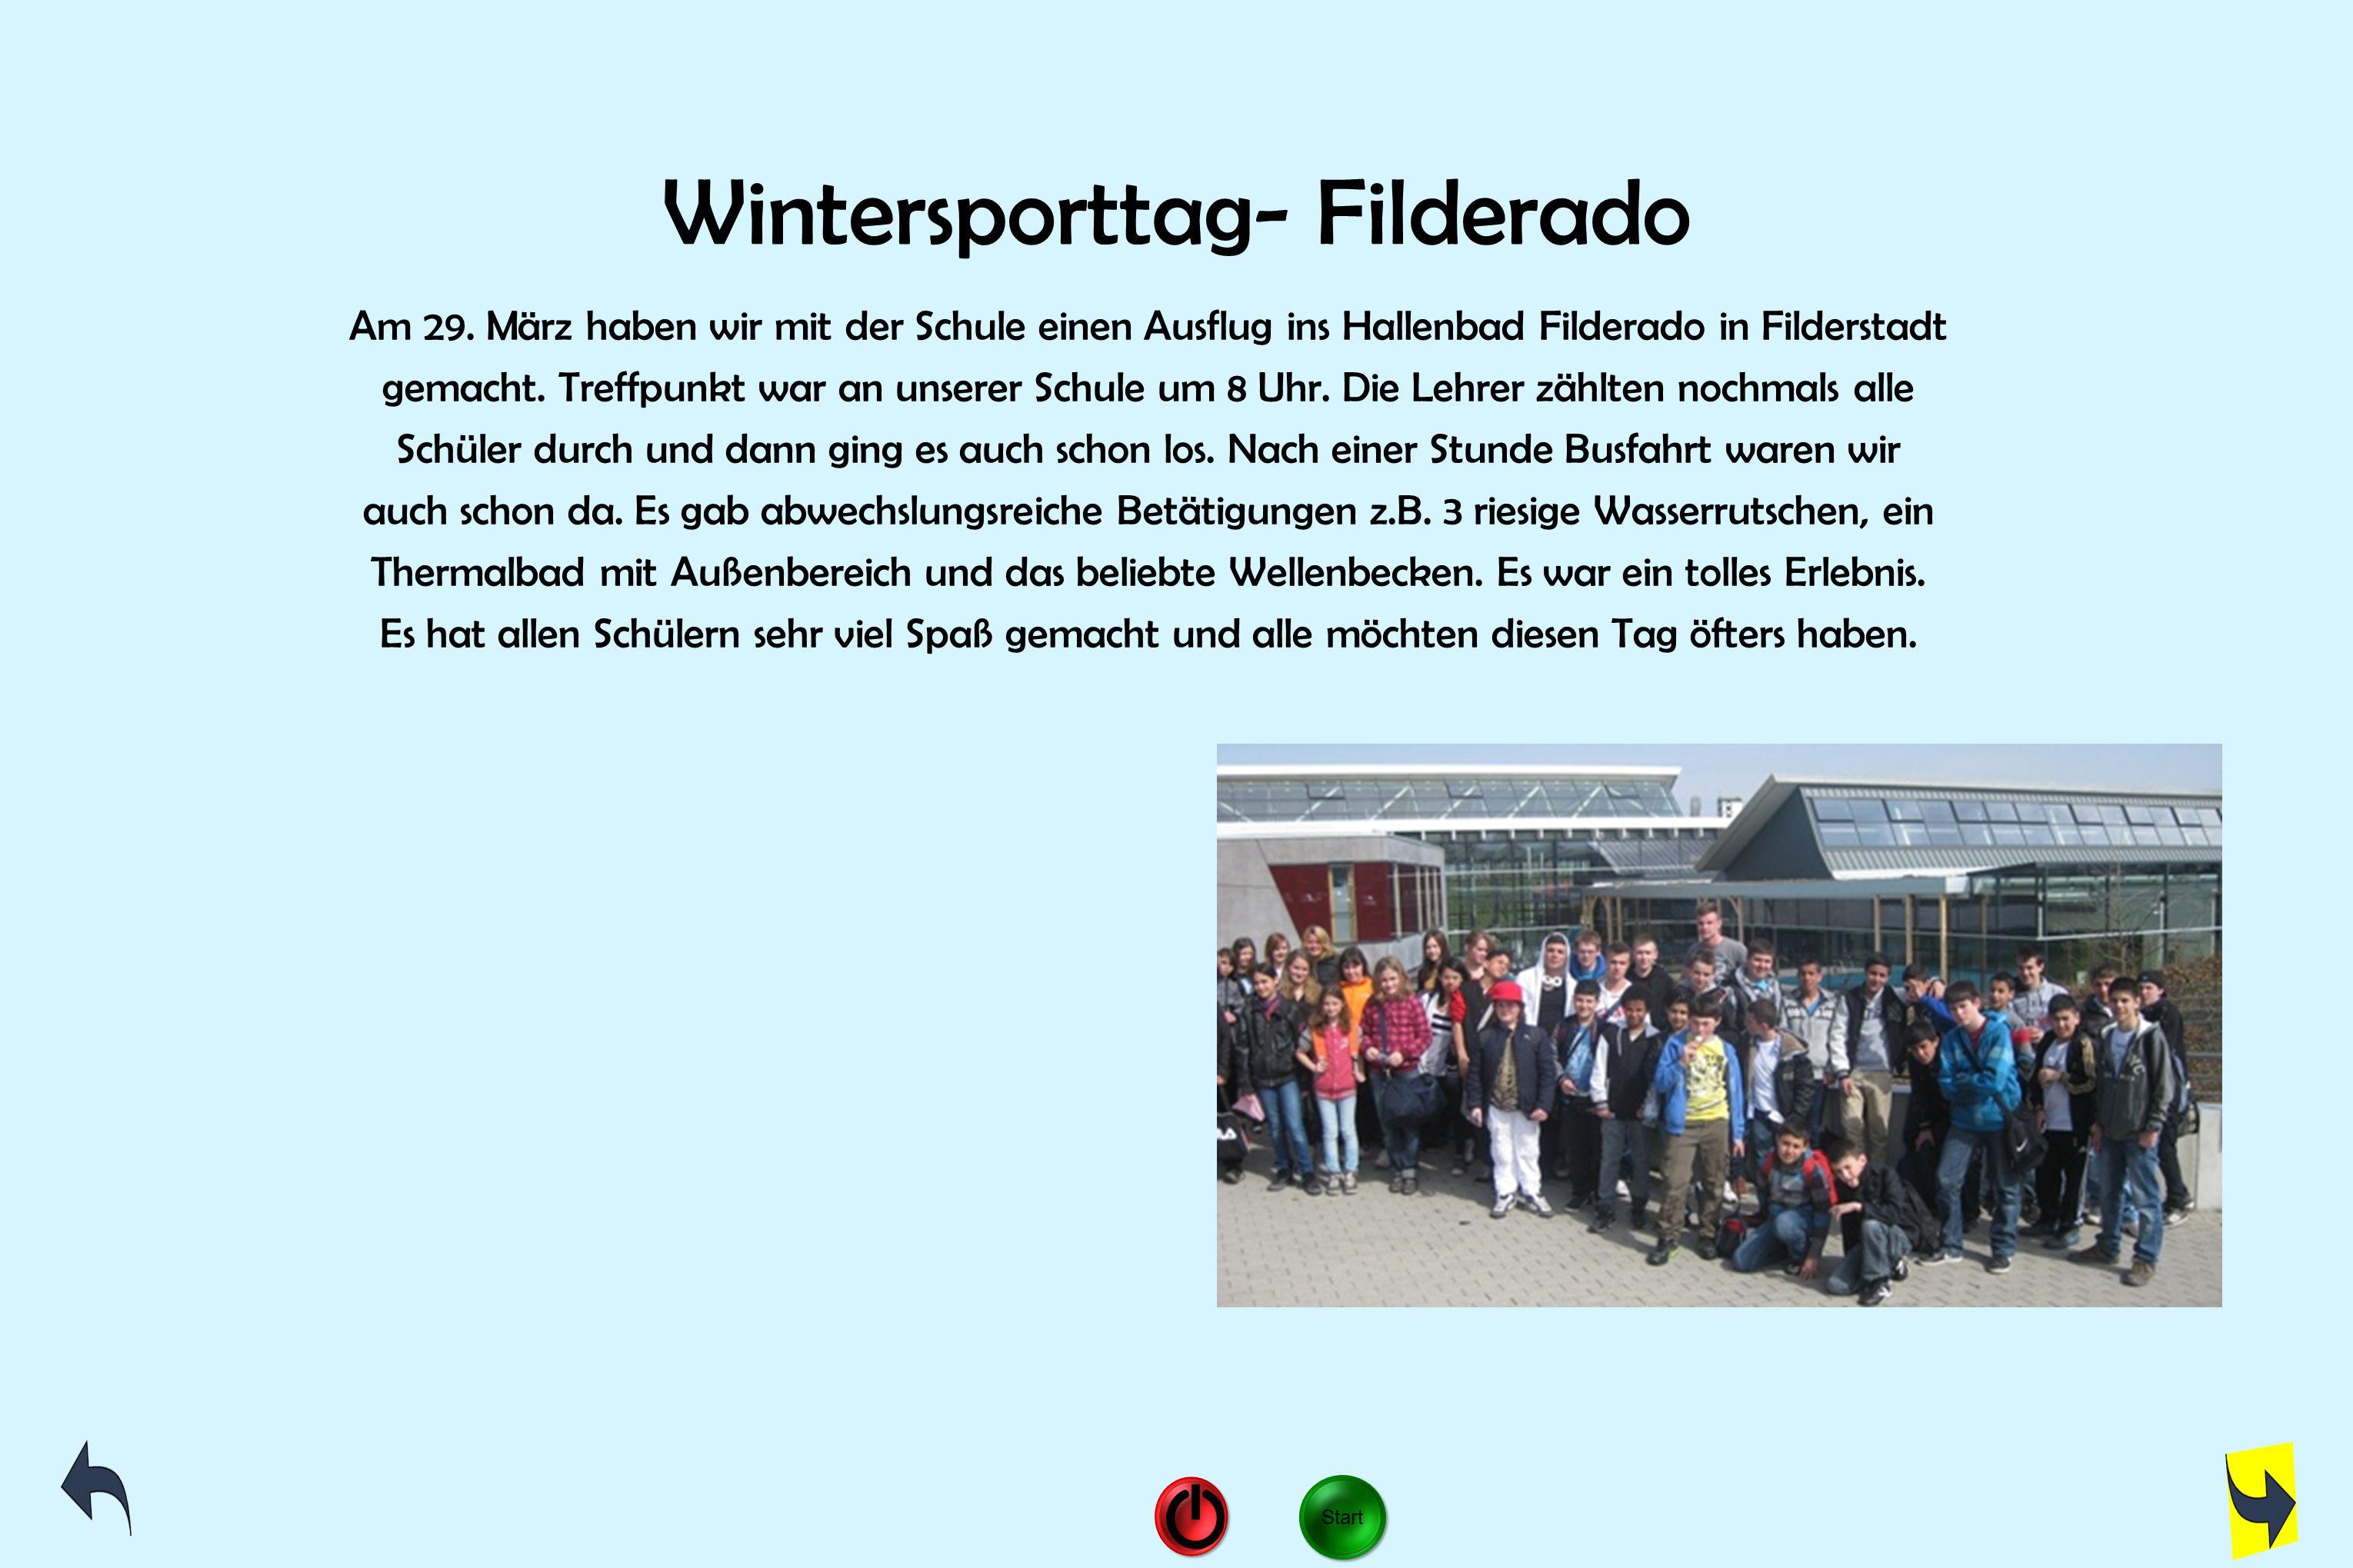 Wintersporttag- Filderado